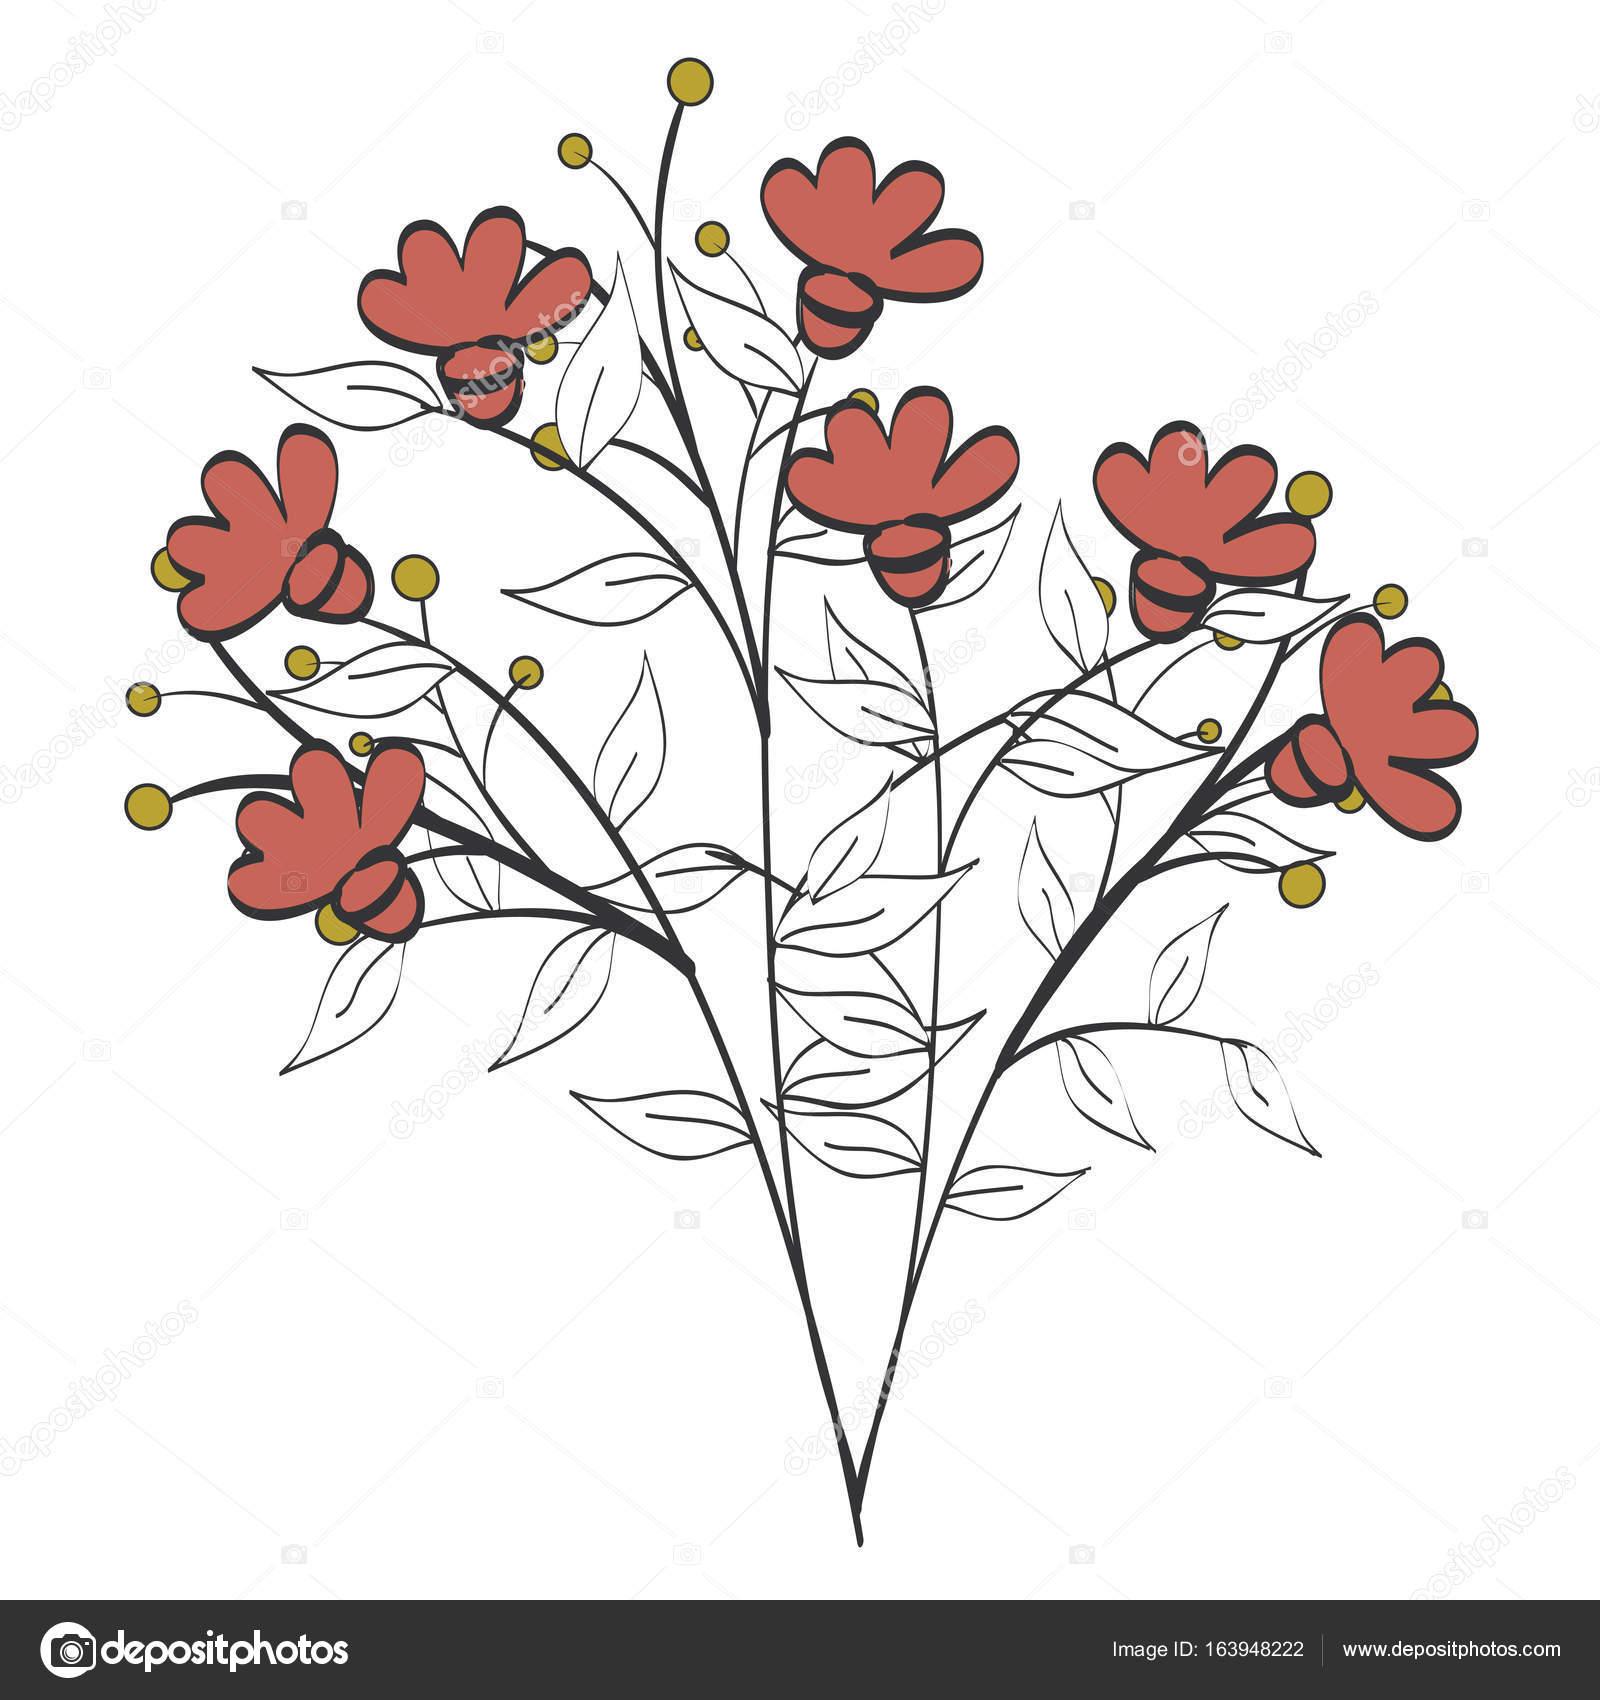 naturals flowers tattoos — Stock Vector © yupiramos #163948222